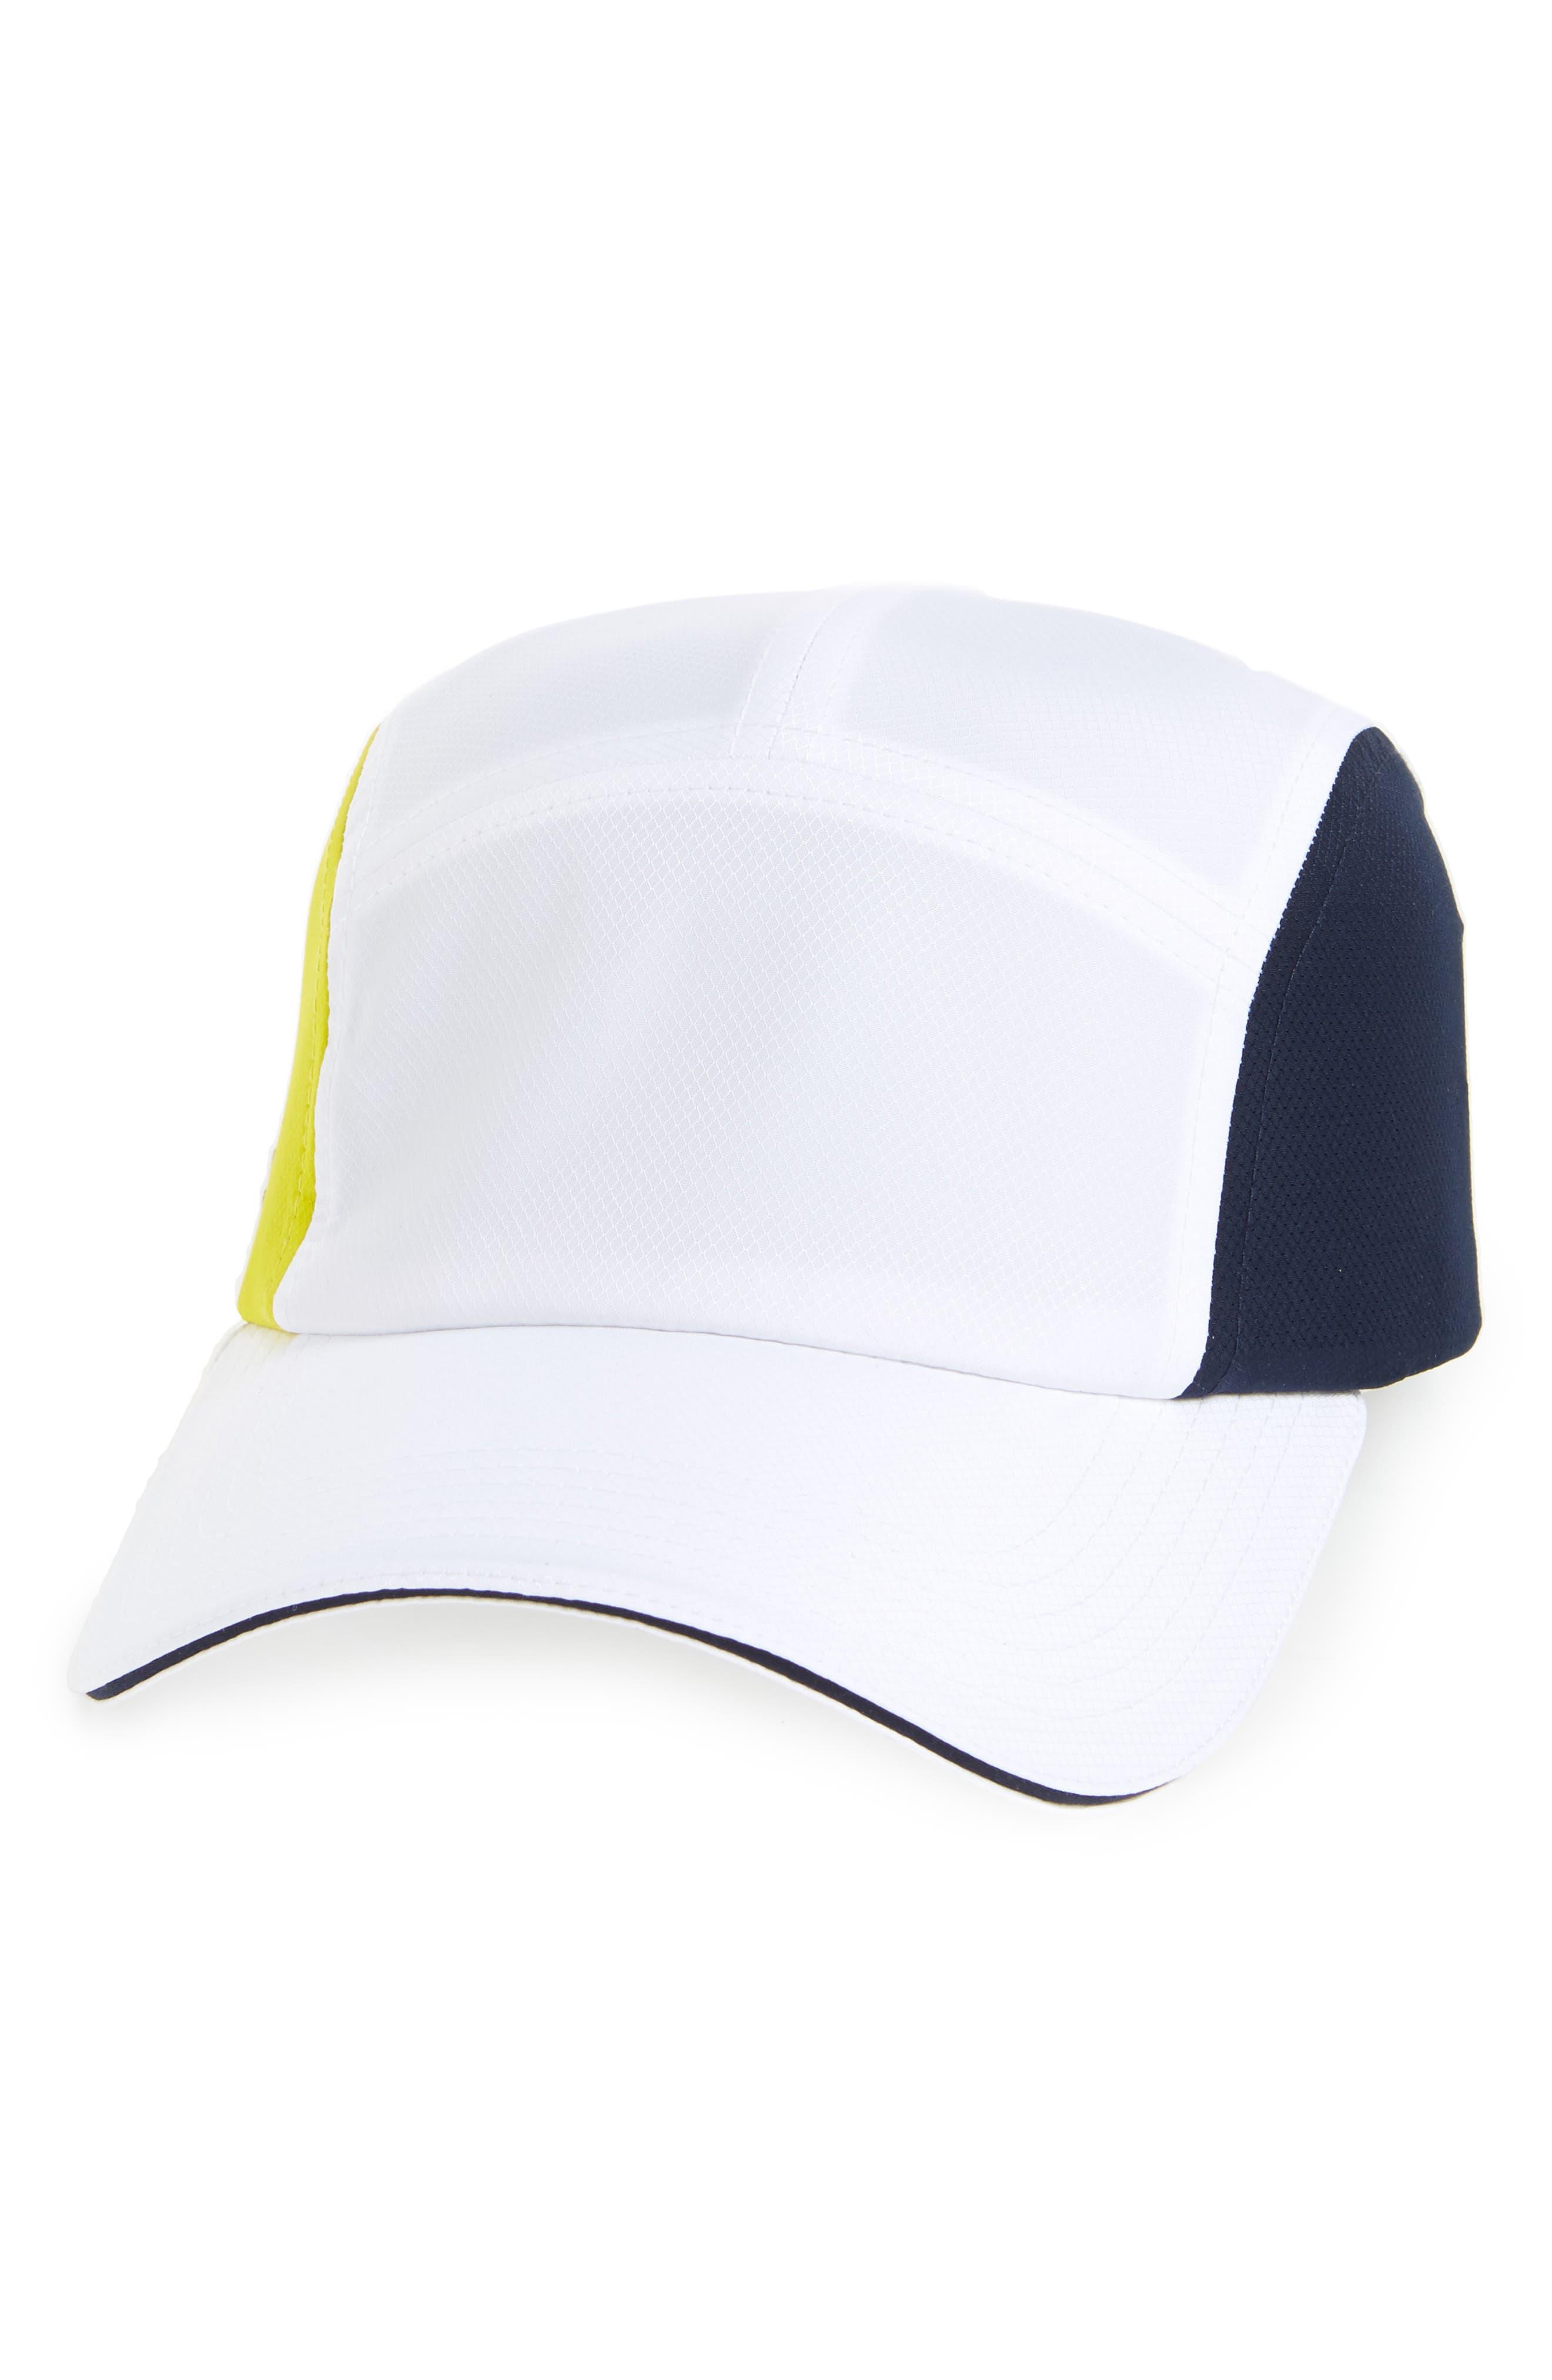 Diamond Weave Baseball Cap,                         Main,                         color,